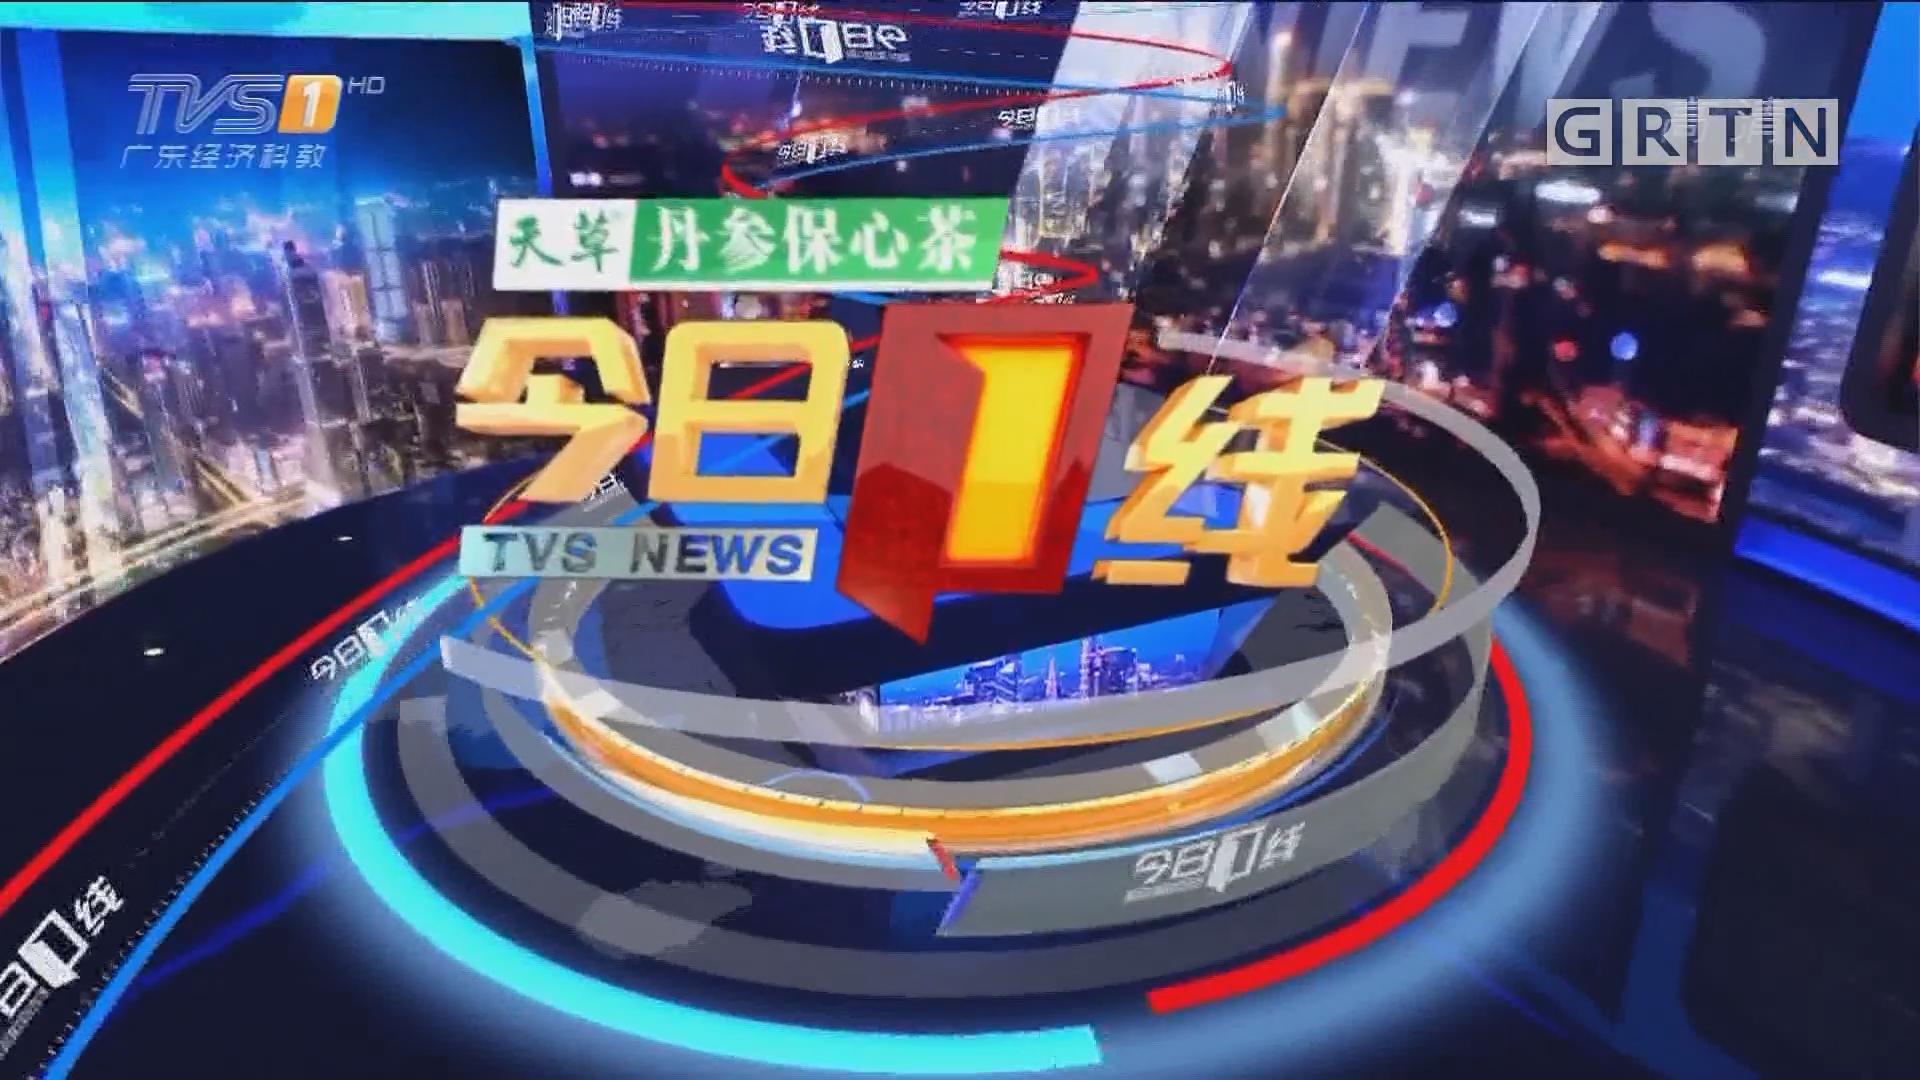 [HD][2019-03-27]今日一线:东莞望牛墩:50斤包裹从天降 砸中女子致多处骨折